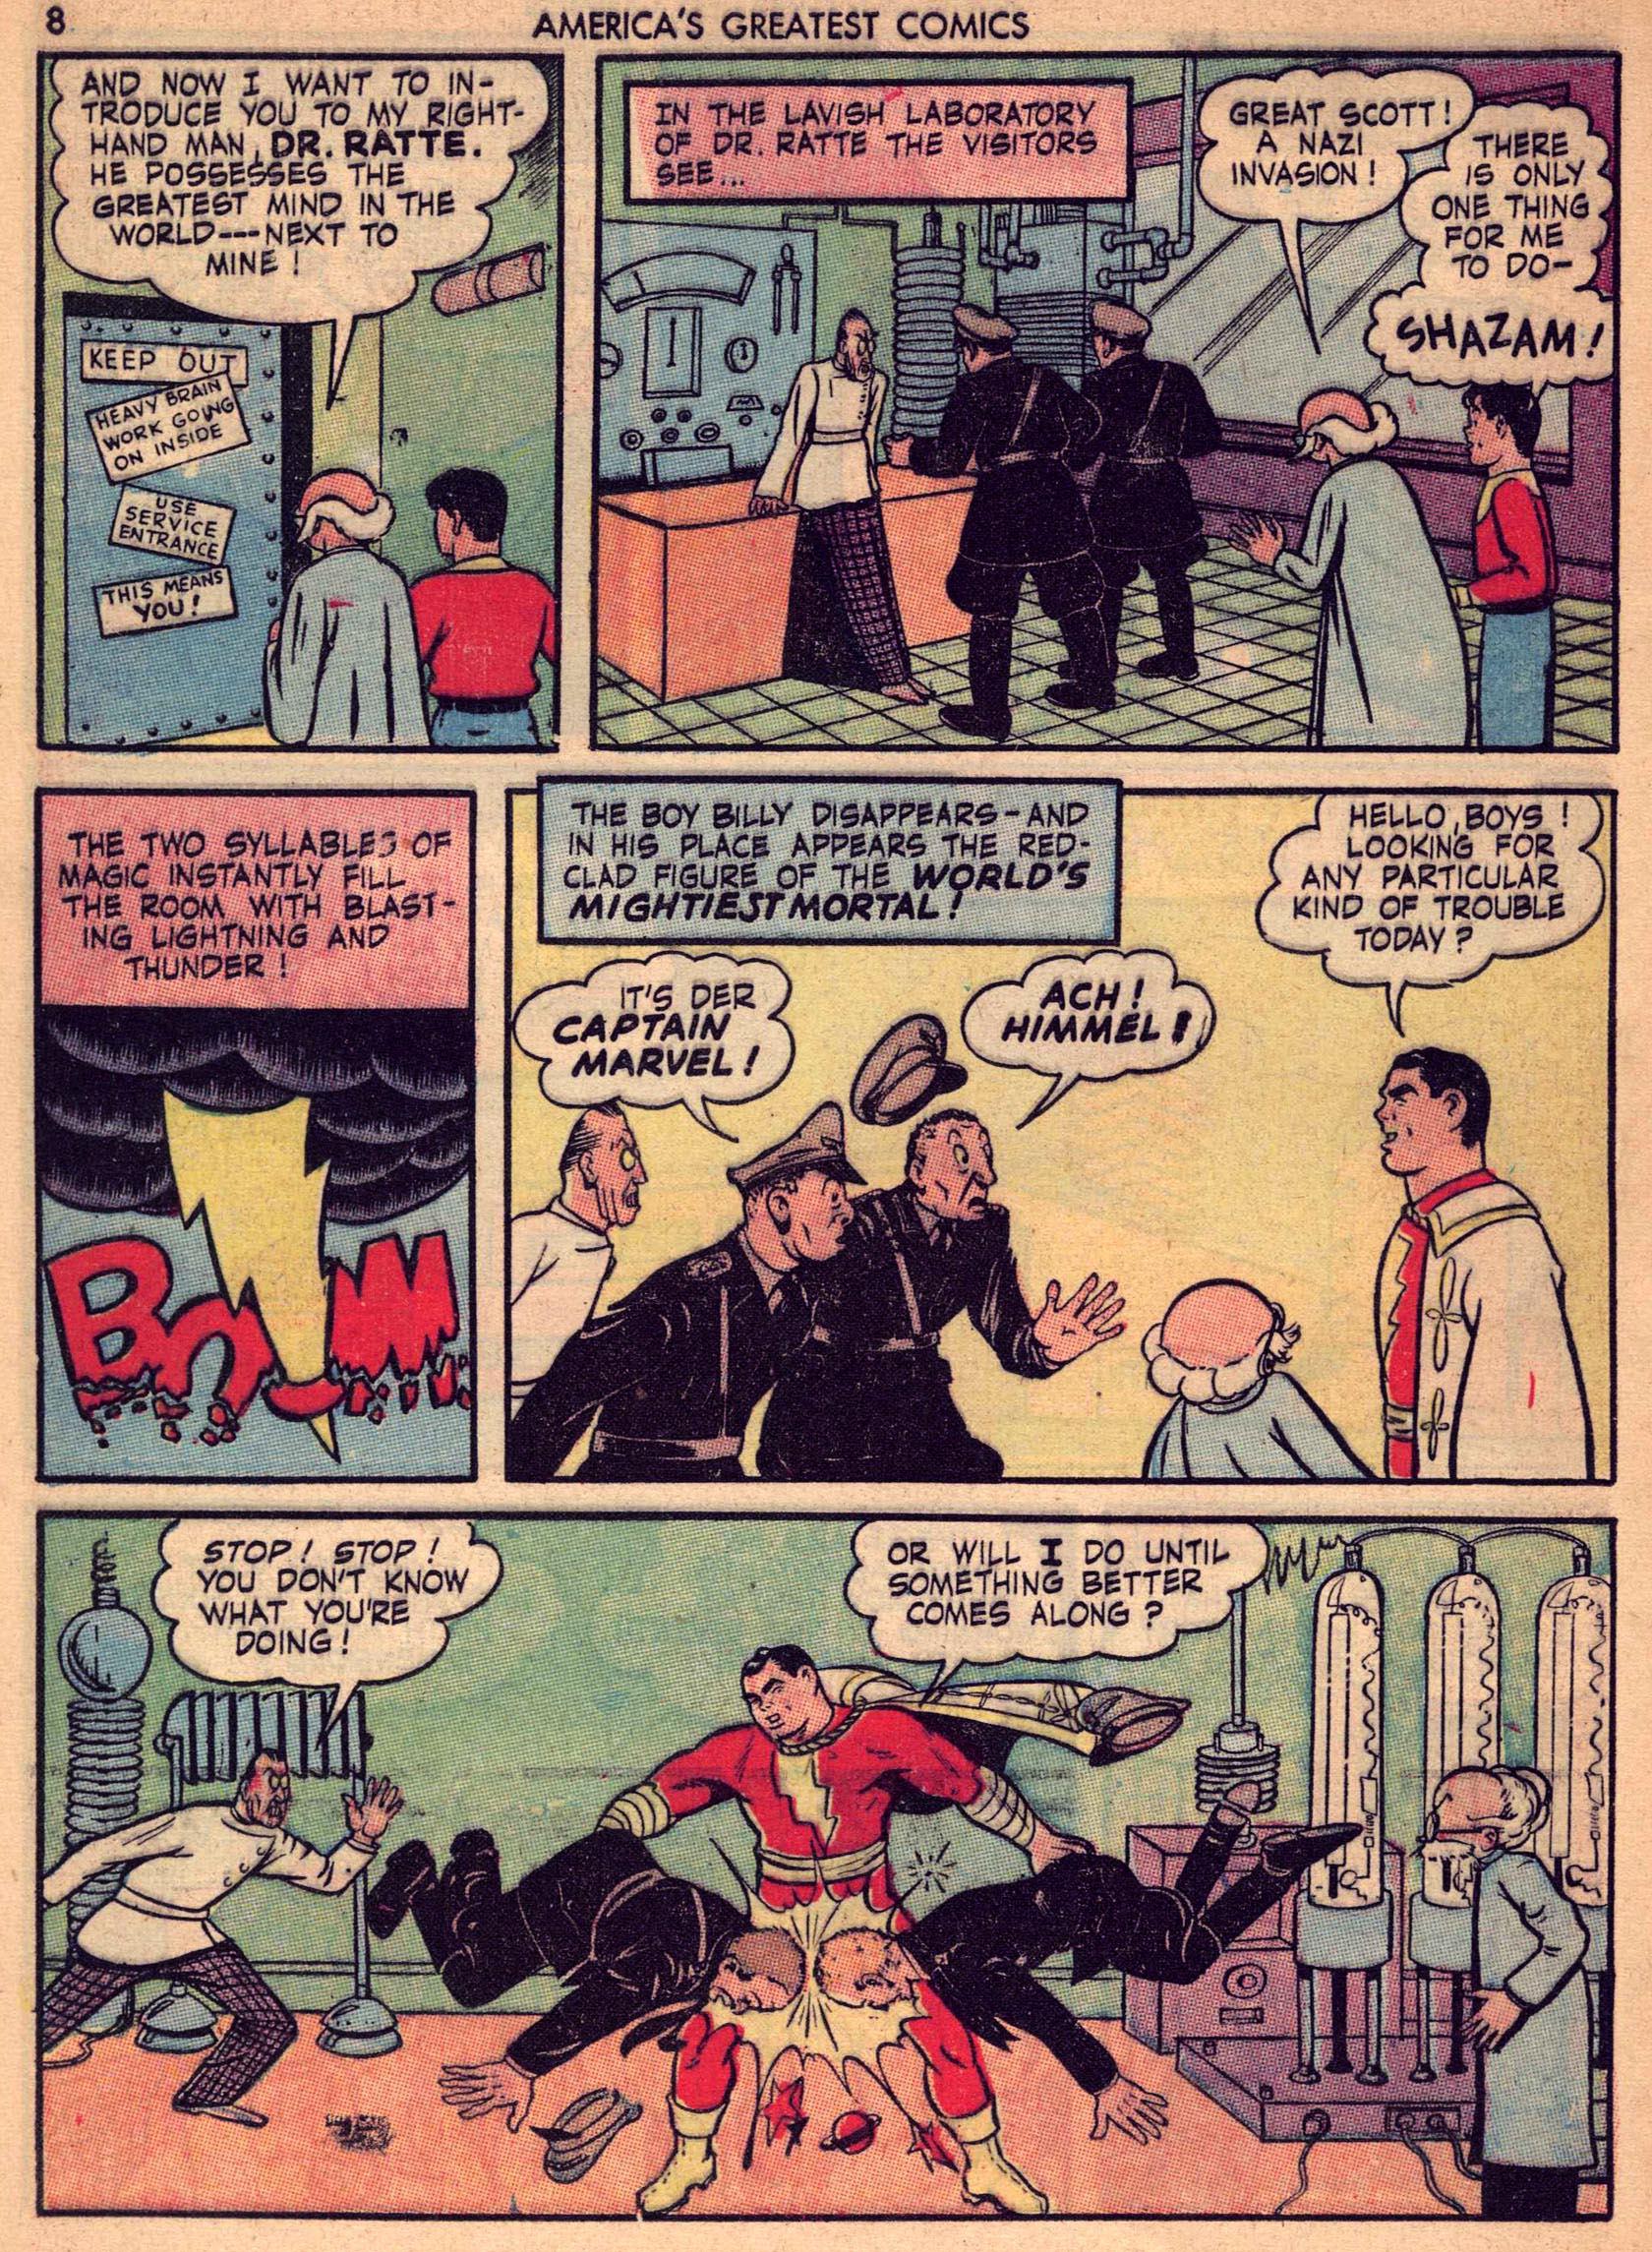 Read online America's Greatest Comics comic -  Issue #7 - 7